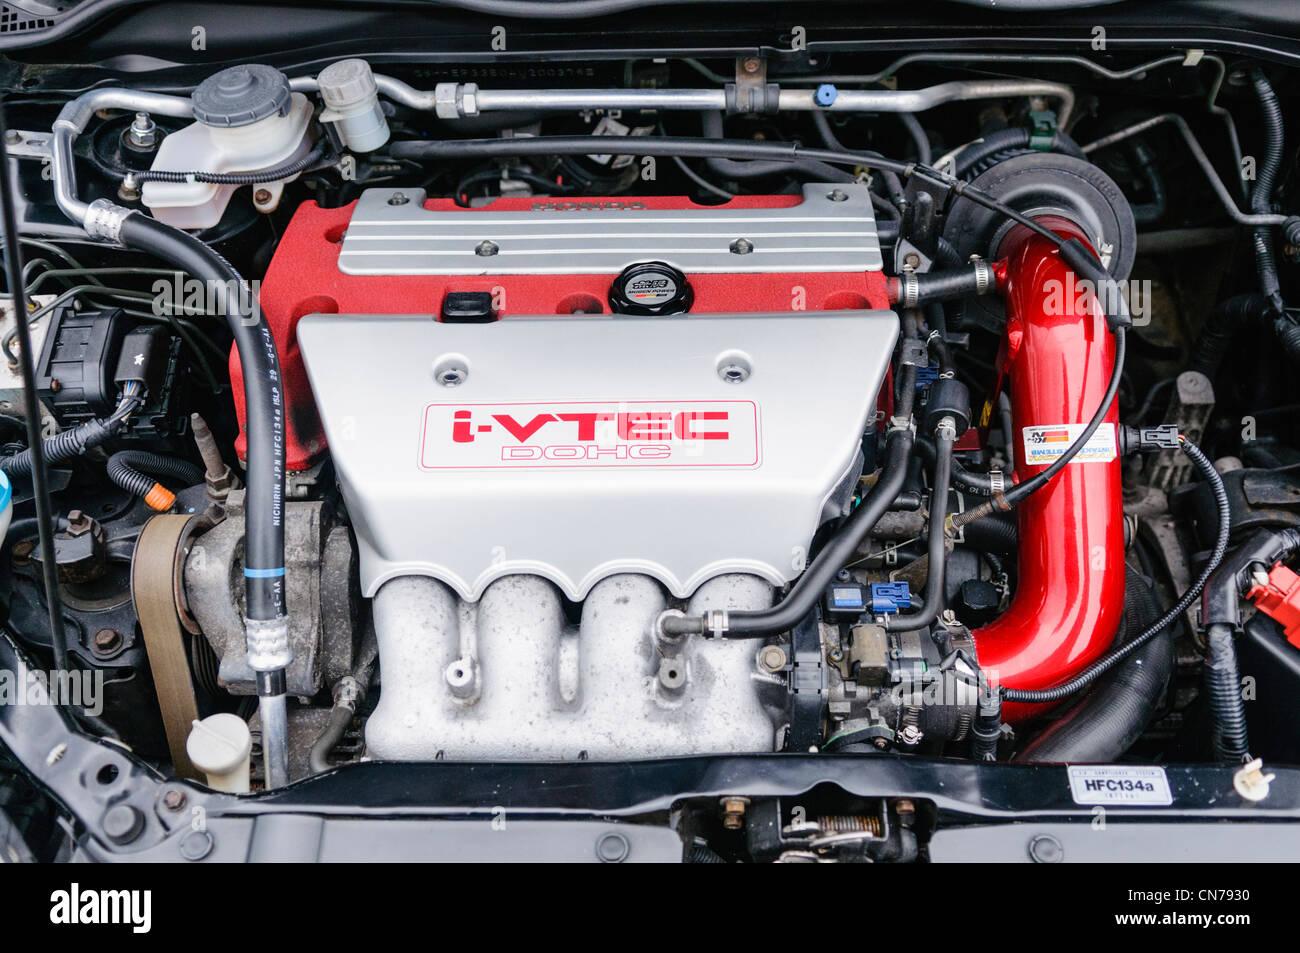 Modified Honda S2000 >> Honda i-VTEC engine Stock Photo, Royalty Free Image: 47489316 - Alamy